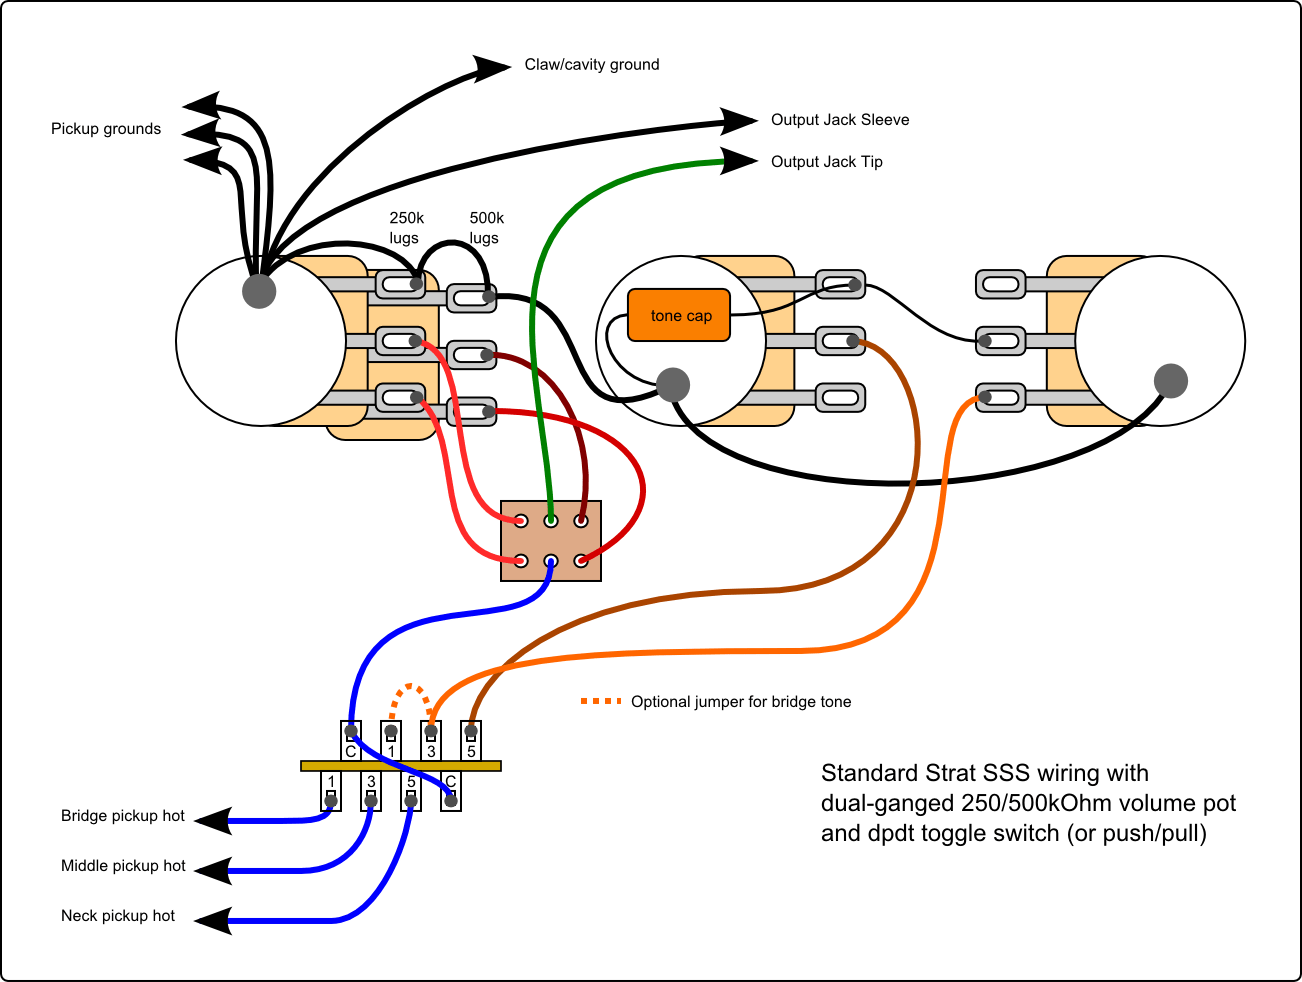 stratocaster wiring diagram 500k pots wiring diagram for rh bestbreweries co david gilmour strat wiring diagram fender squier strat wiring diagram [ 1302 x 982 Pixel ]